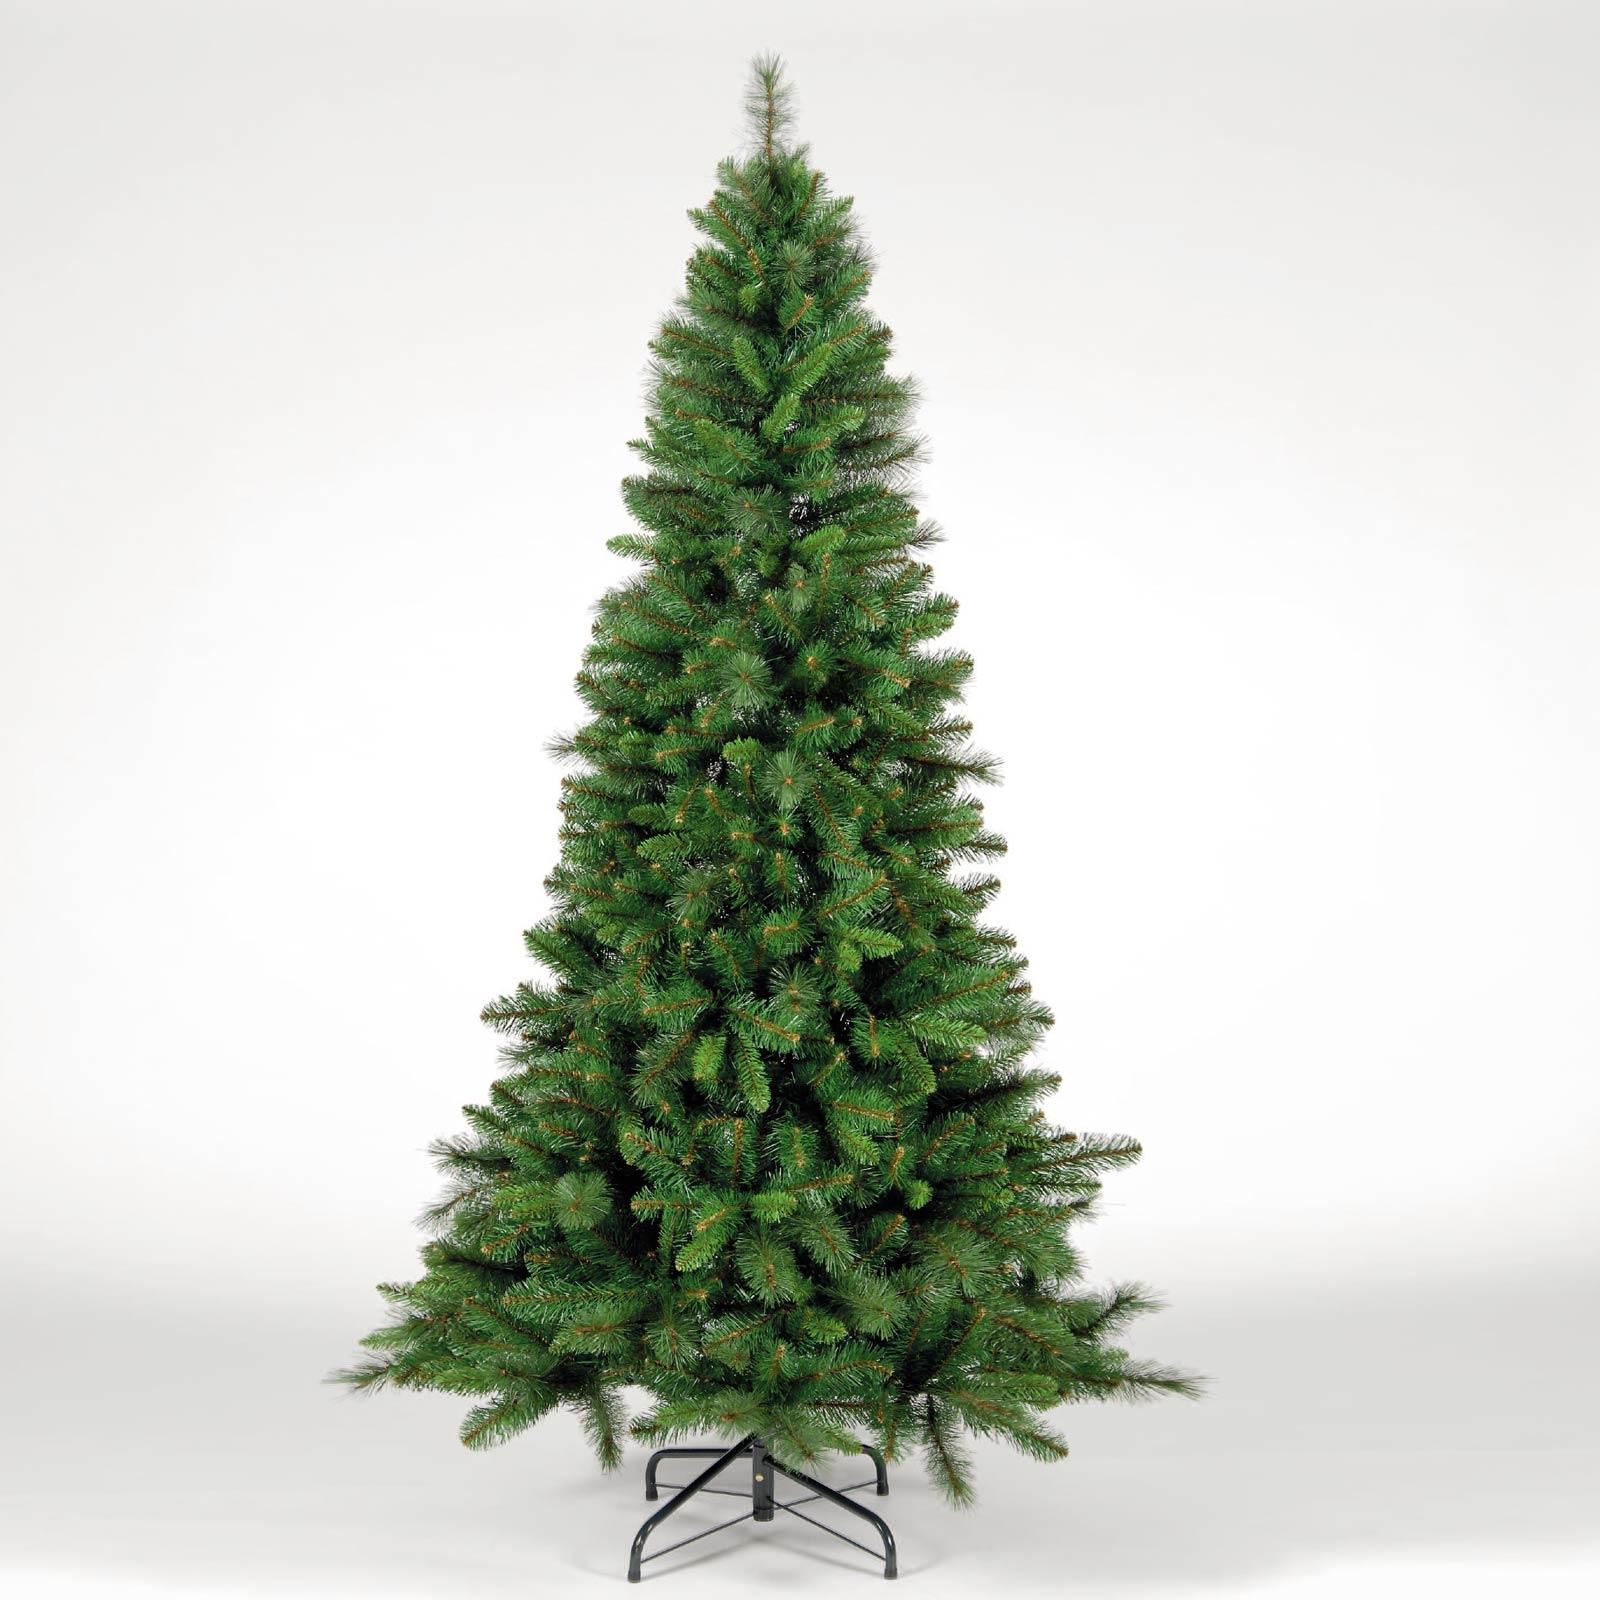 Christmas Trees and Lights 7ft Manitoba Spruce Slim Green Christmas Tree